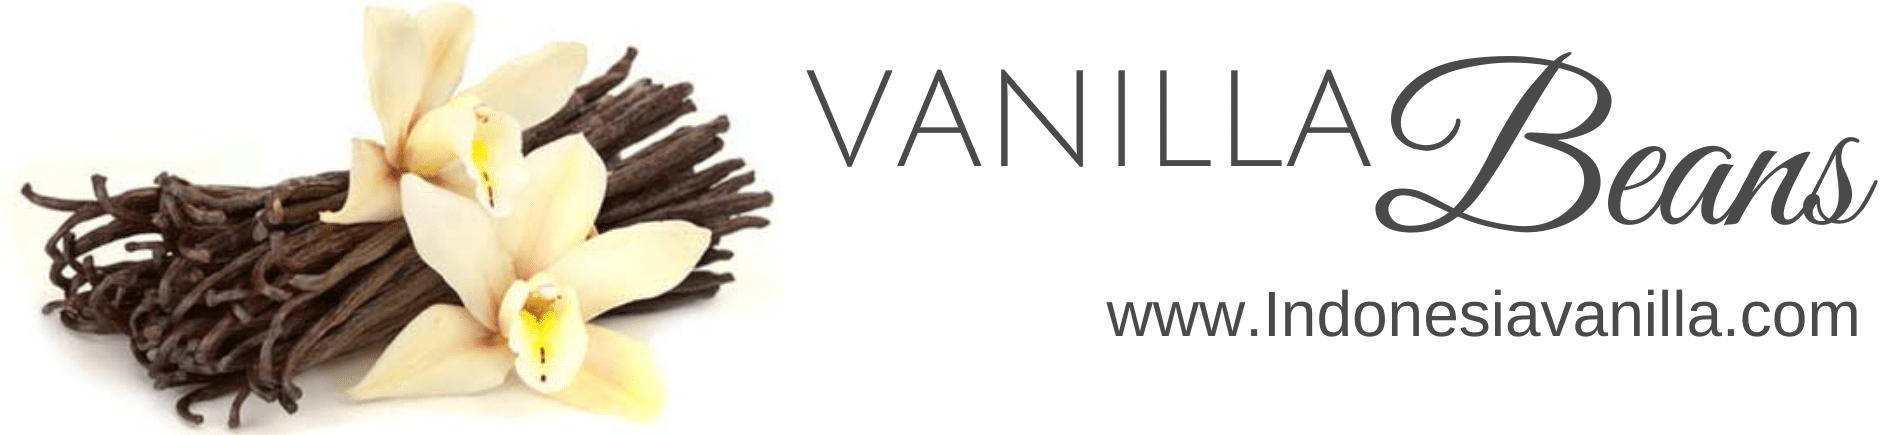 Vanilla Beans Supplier Indonesia